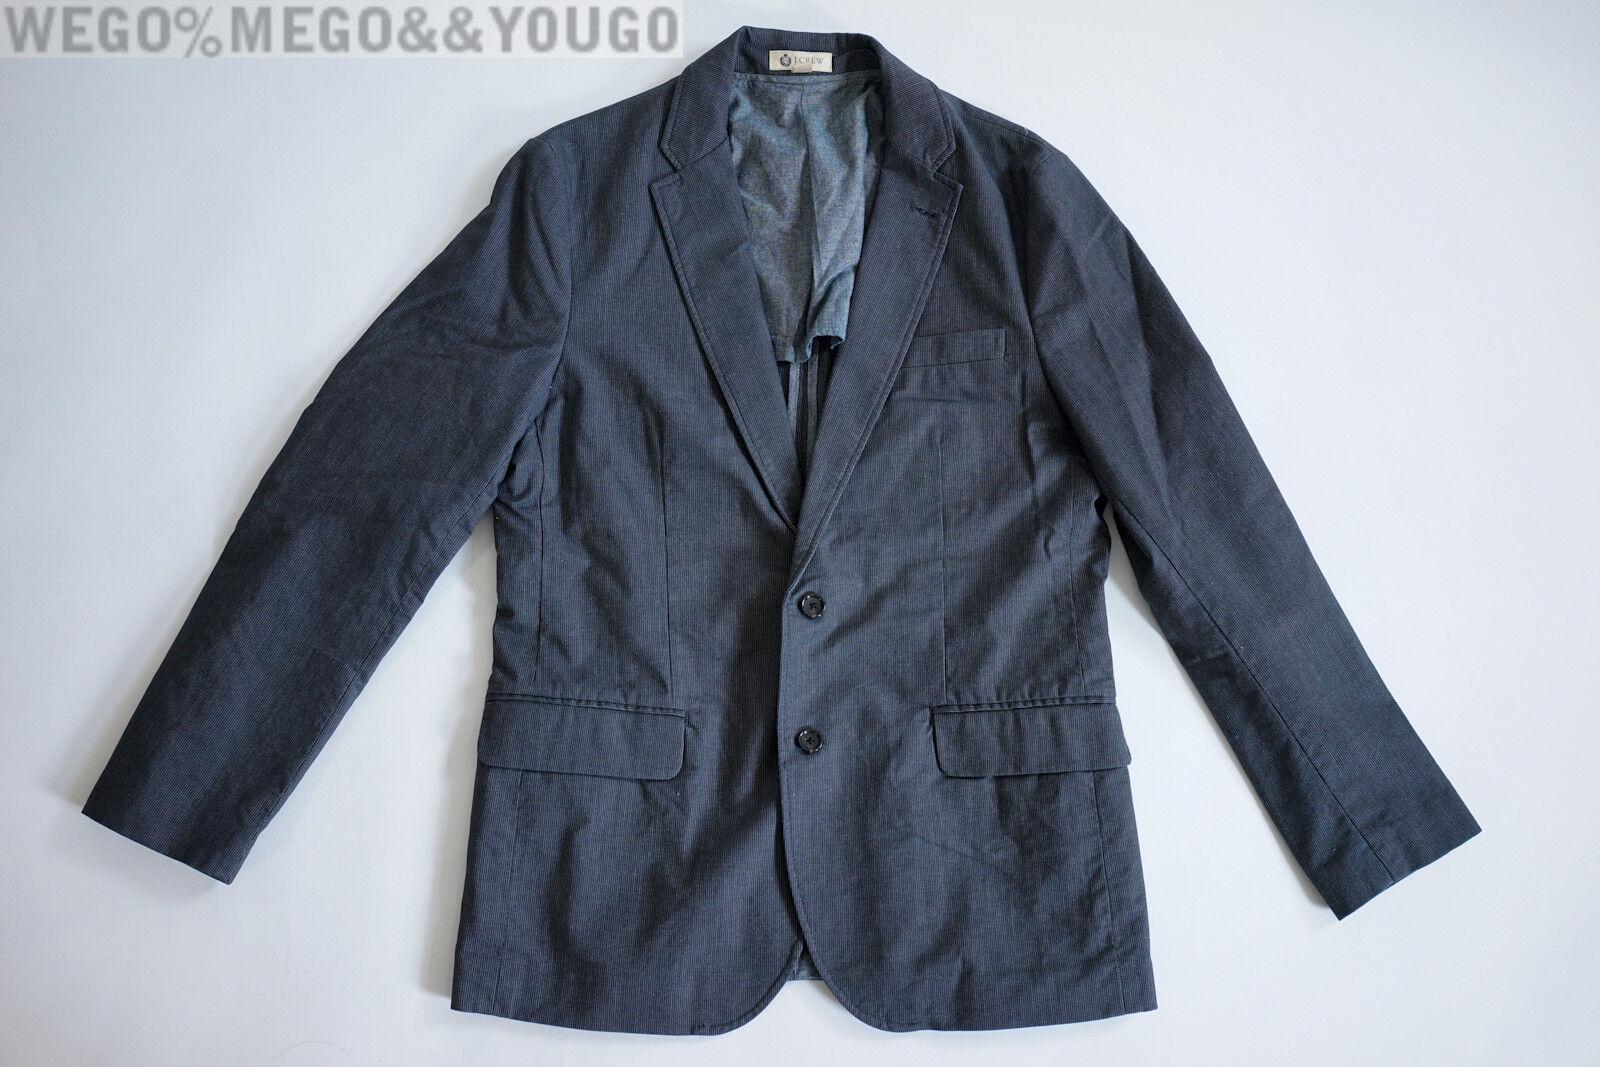 J Crew Ludlow Sportcoat in Stripe Cotton size Medium M Style 23557